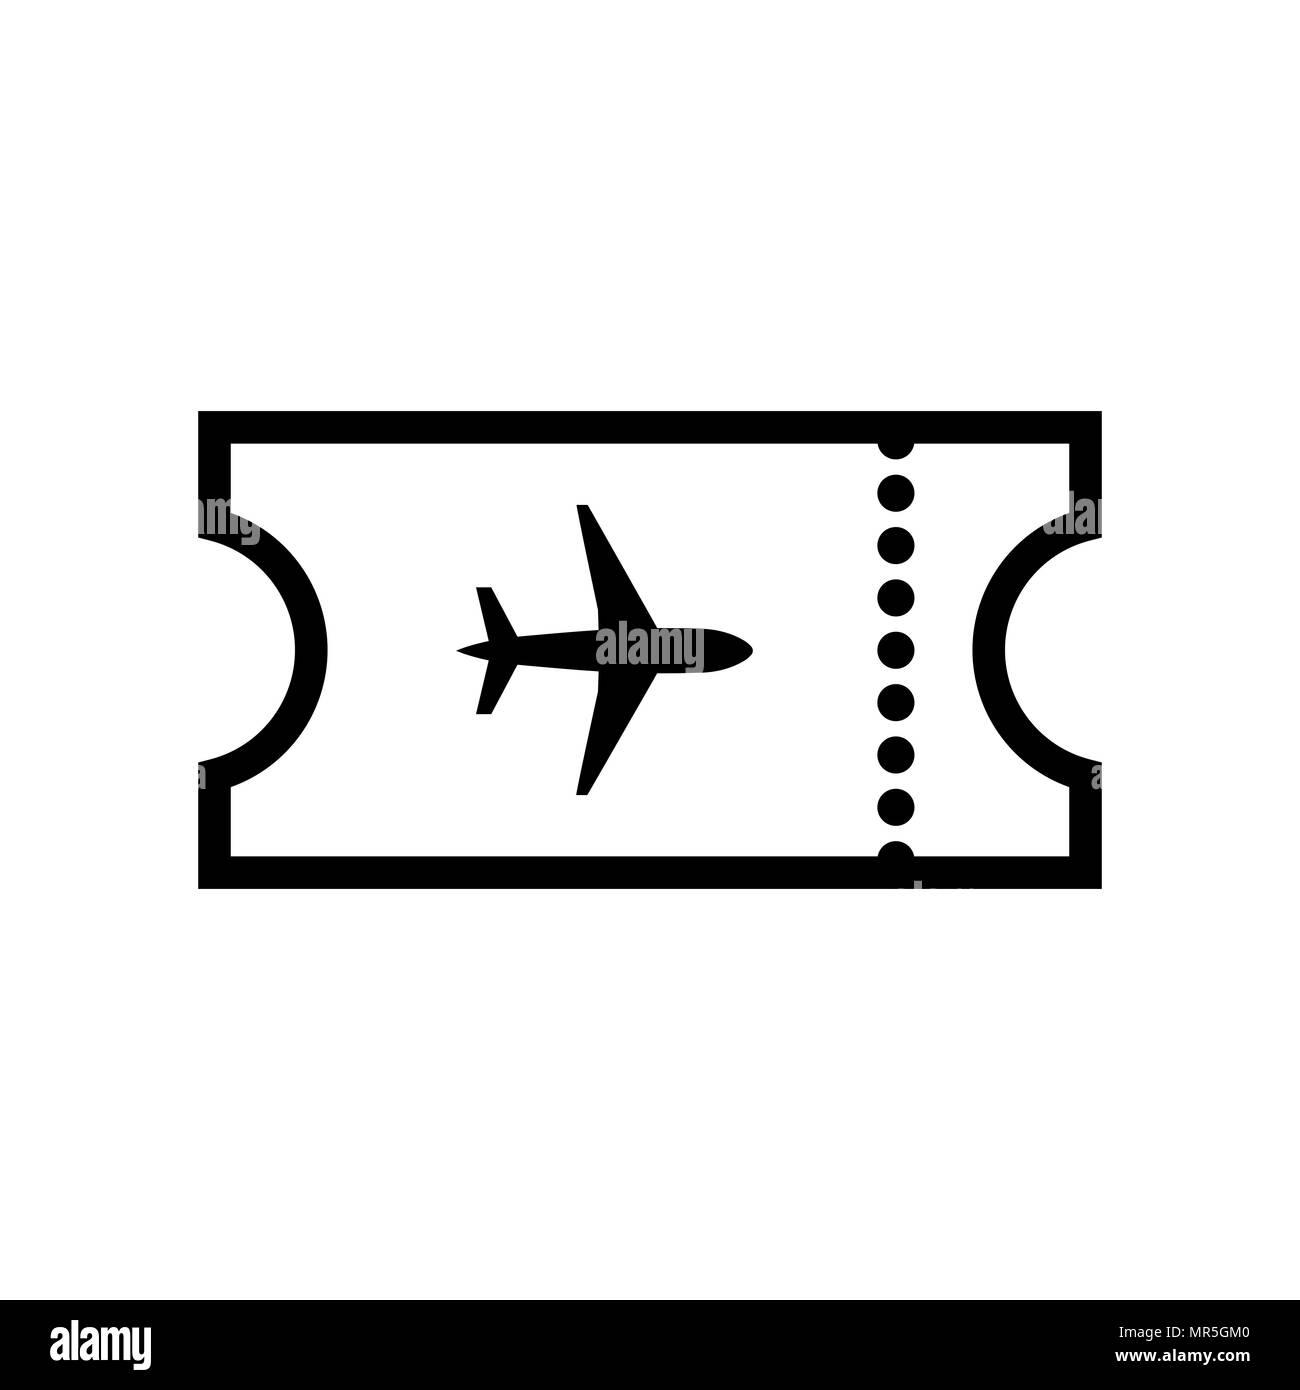 The Blank Ticket Plane Icon Travel Symbol Stock Vector Art